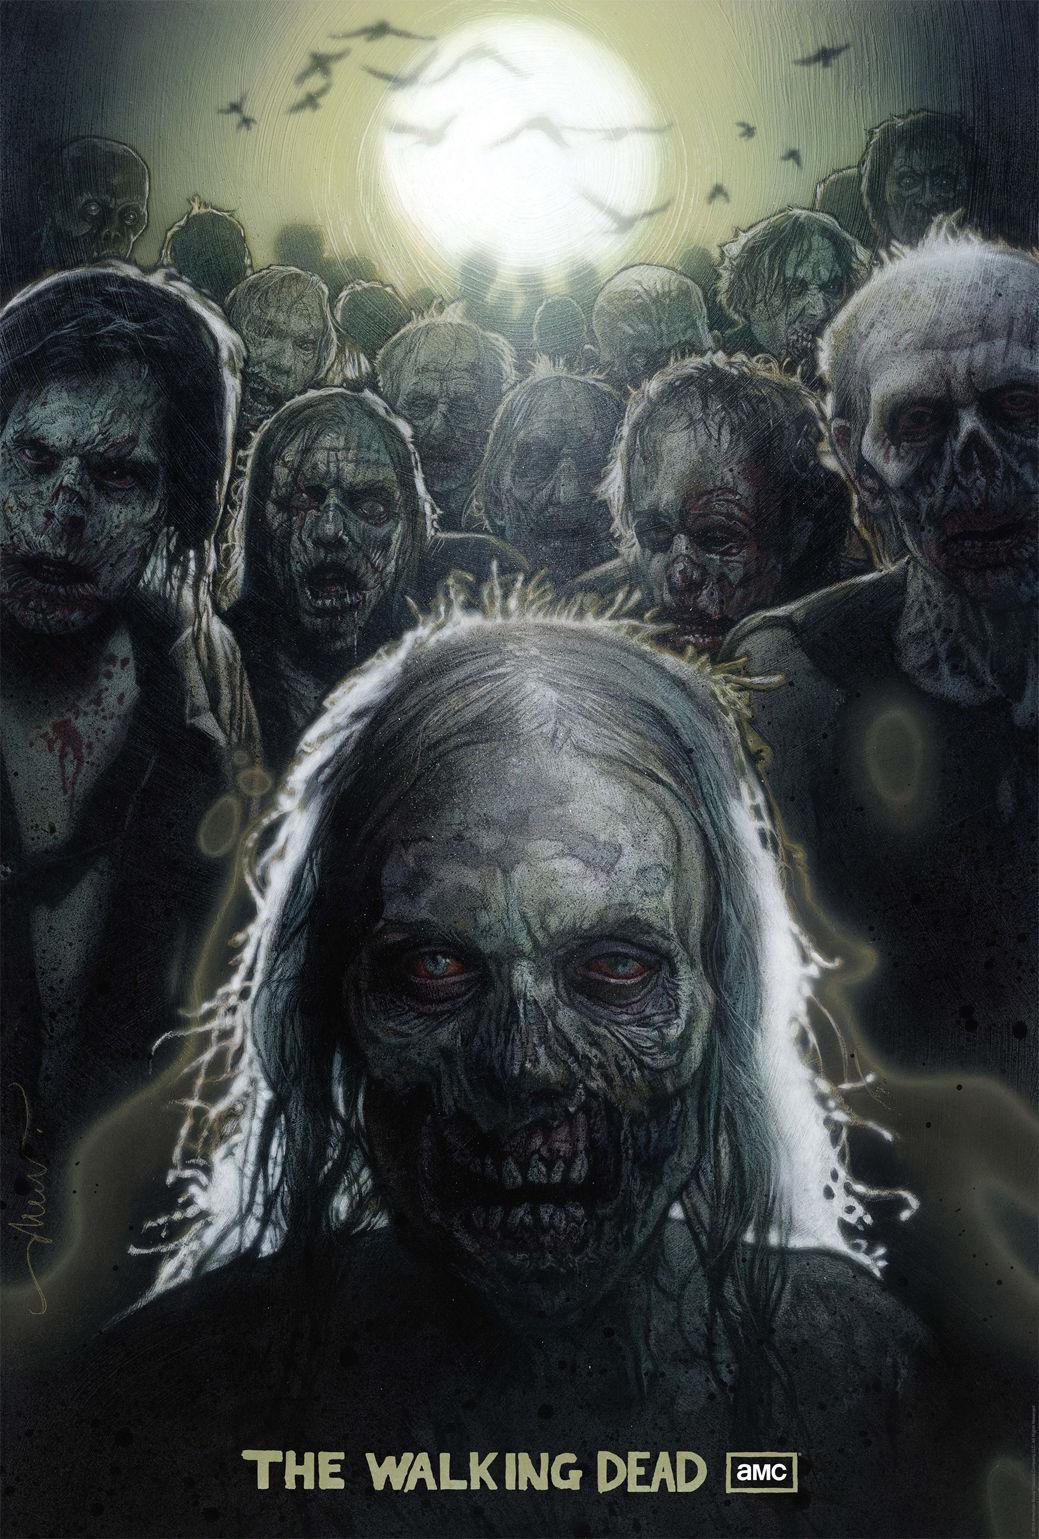 "The Walking Dead <font><b>1</b></font> <font><b>2</b></font> 3 4 TV Zombie Fabric Poster 36"" <font><b>x</b></font> <font><b>24</b></font>"" Decor <font><b>23</b></font>"